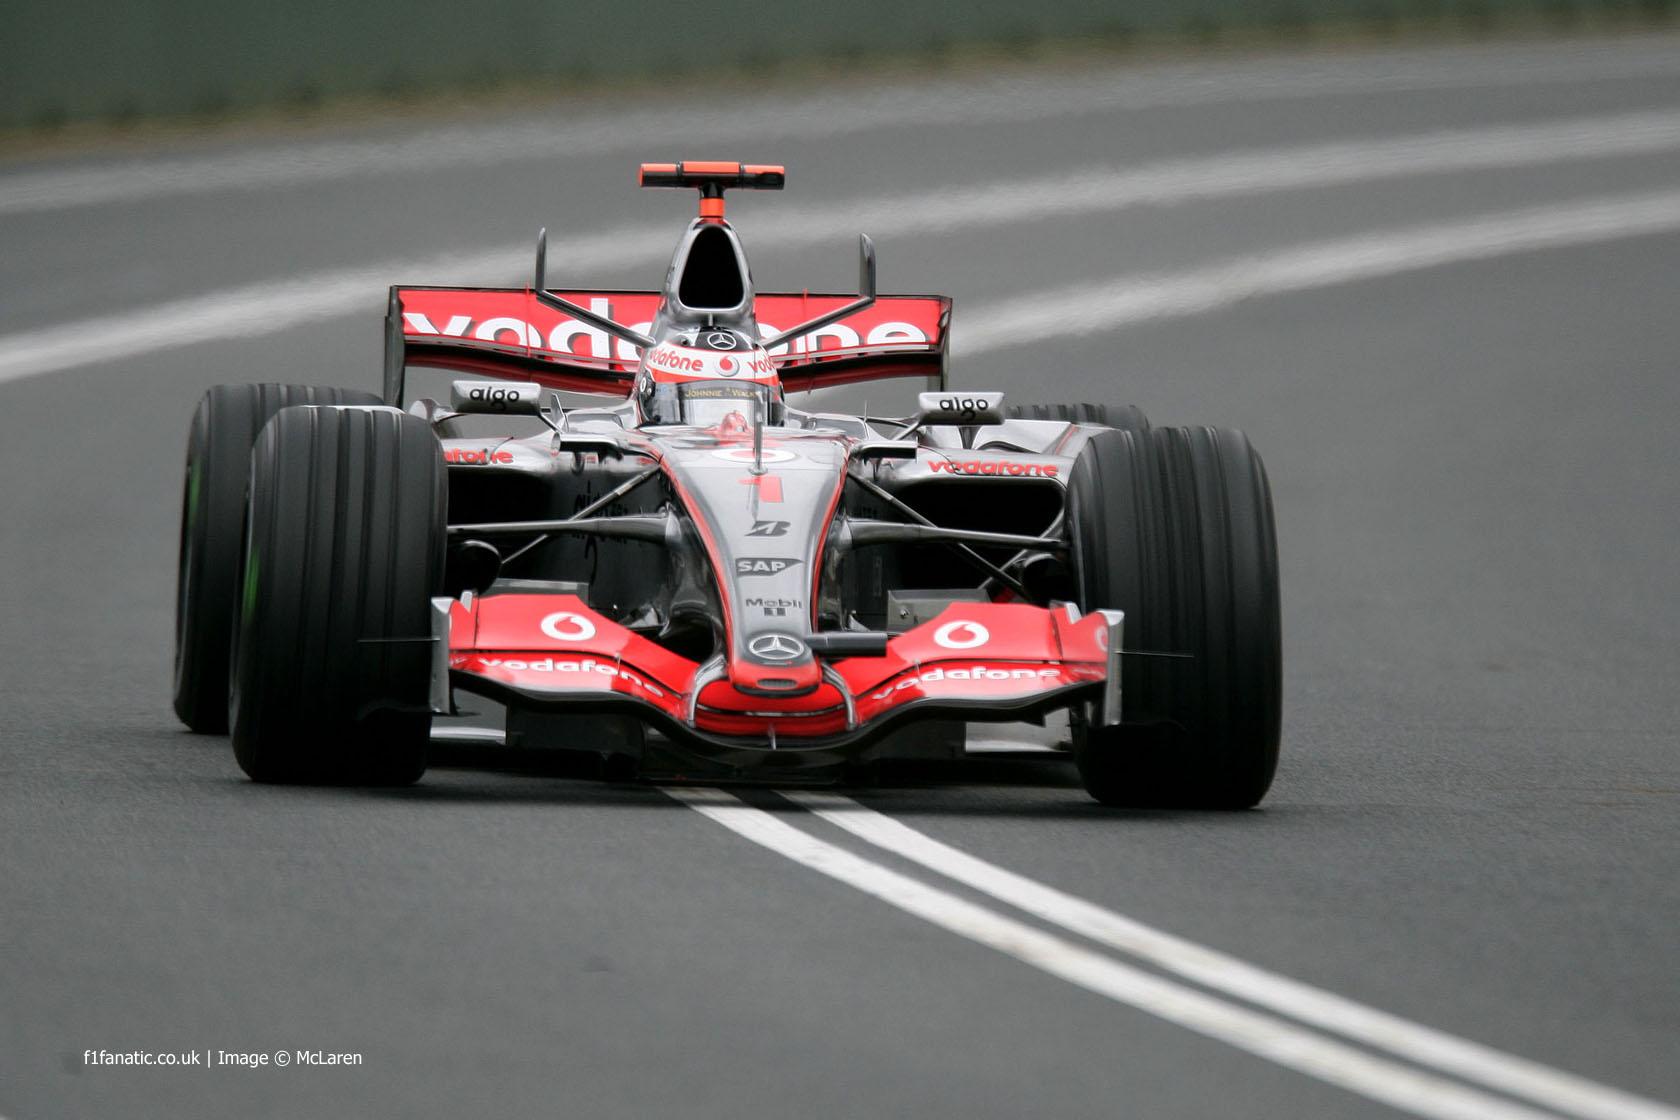 Fernando Alonso, McLaren, Melbourne, 2007